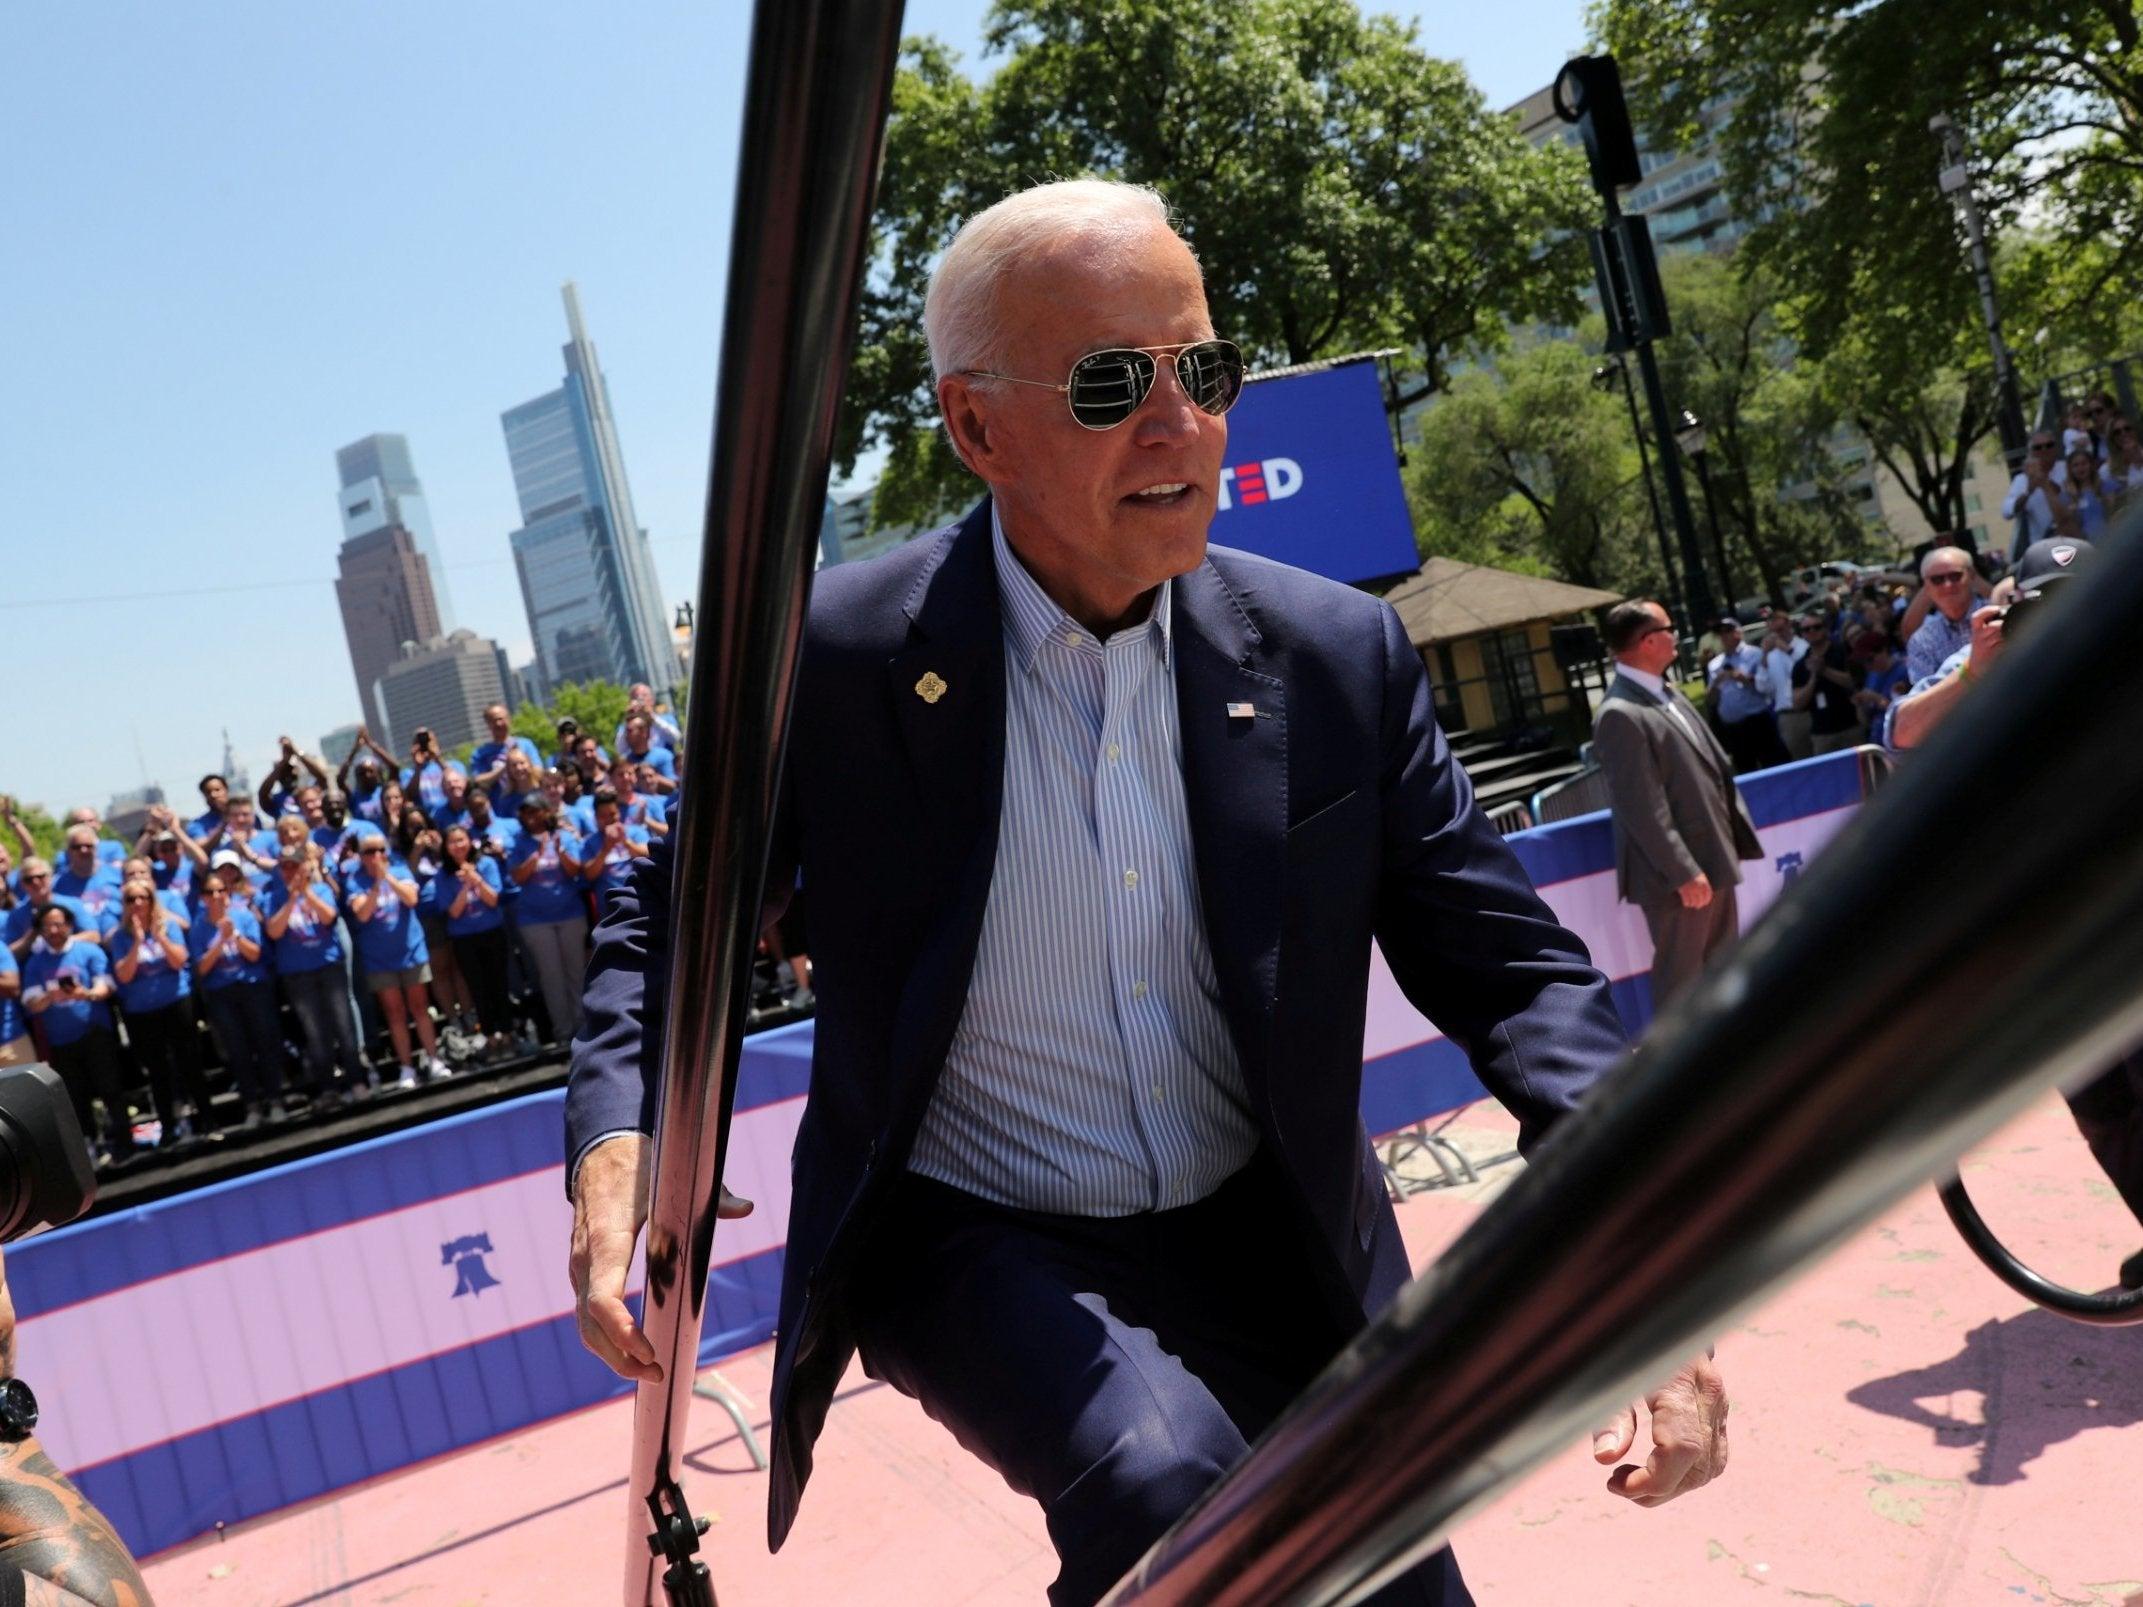 2020 election poll: Joe Biden's lead shrinks to zero against Bernie Sanders in critical Iowa